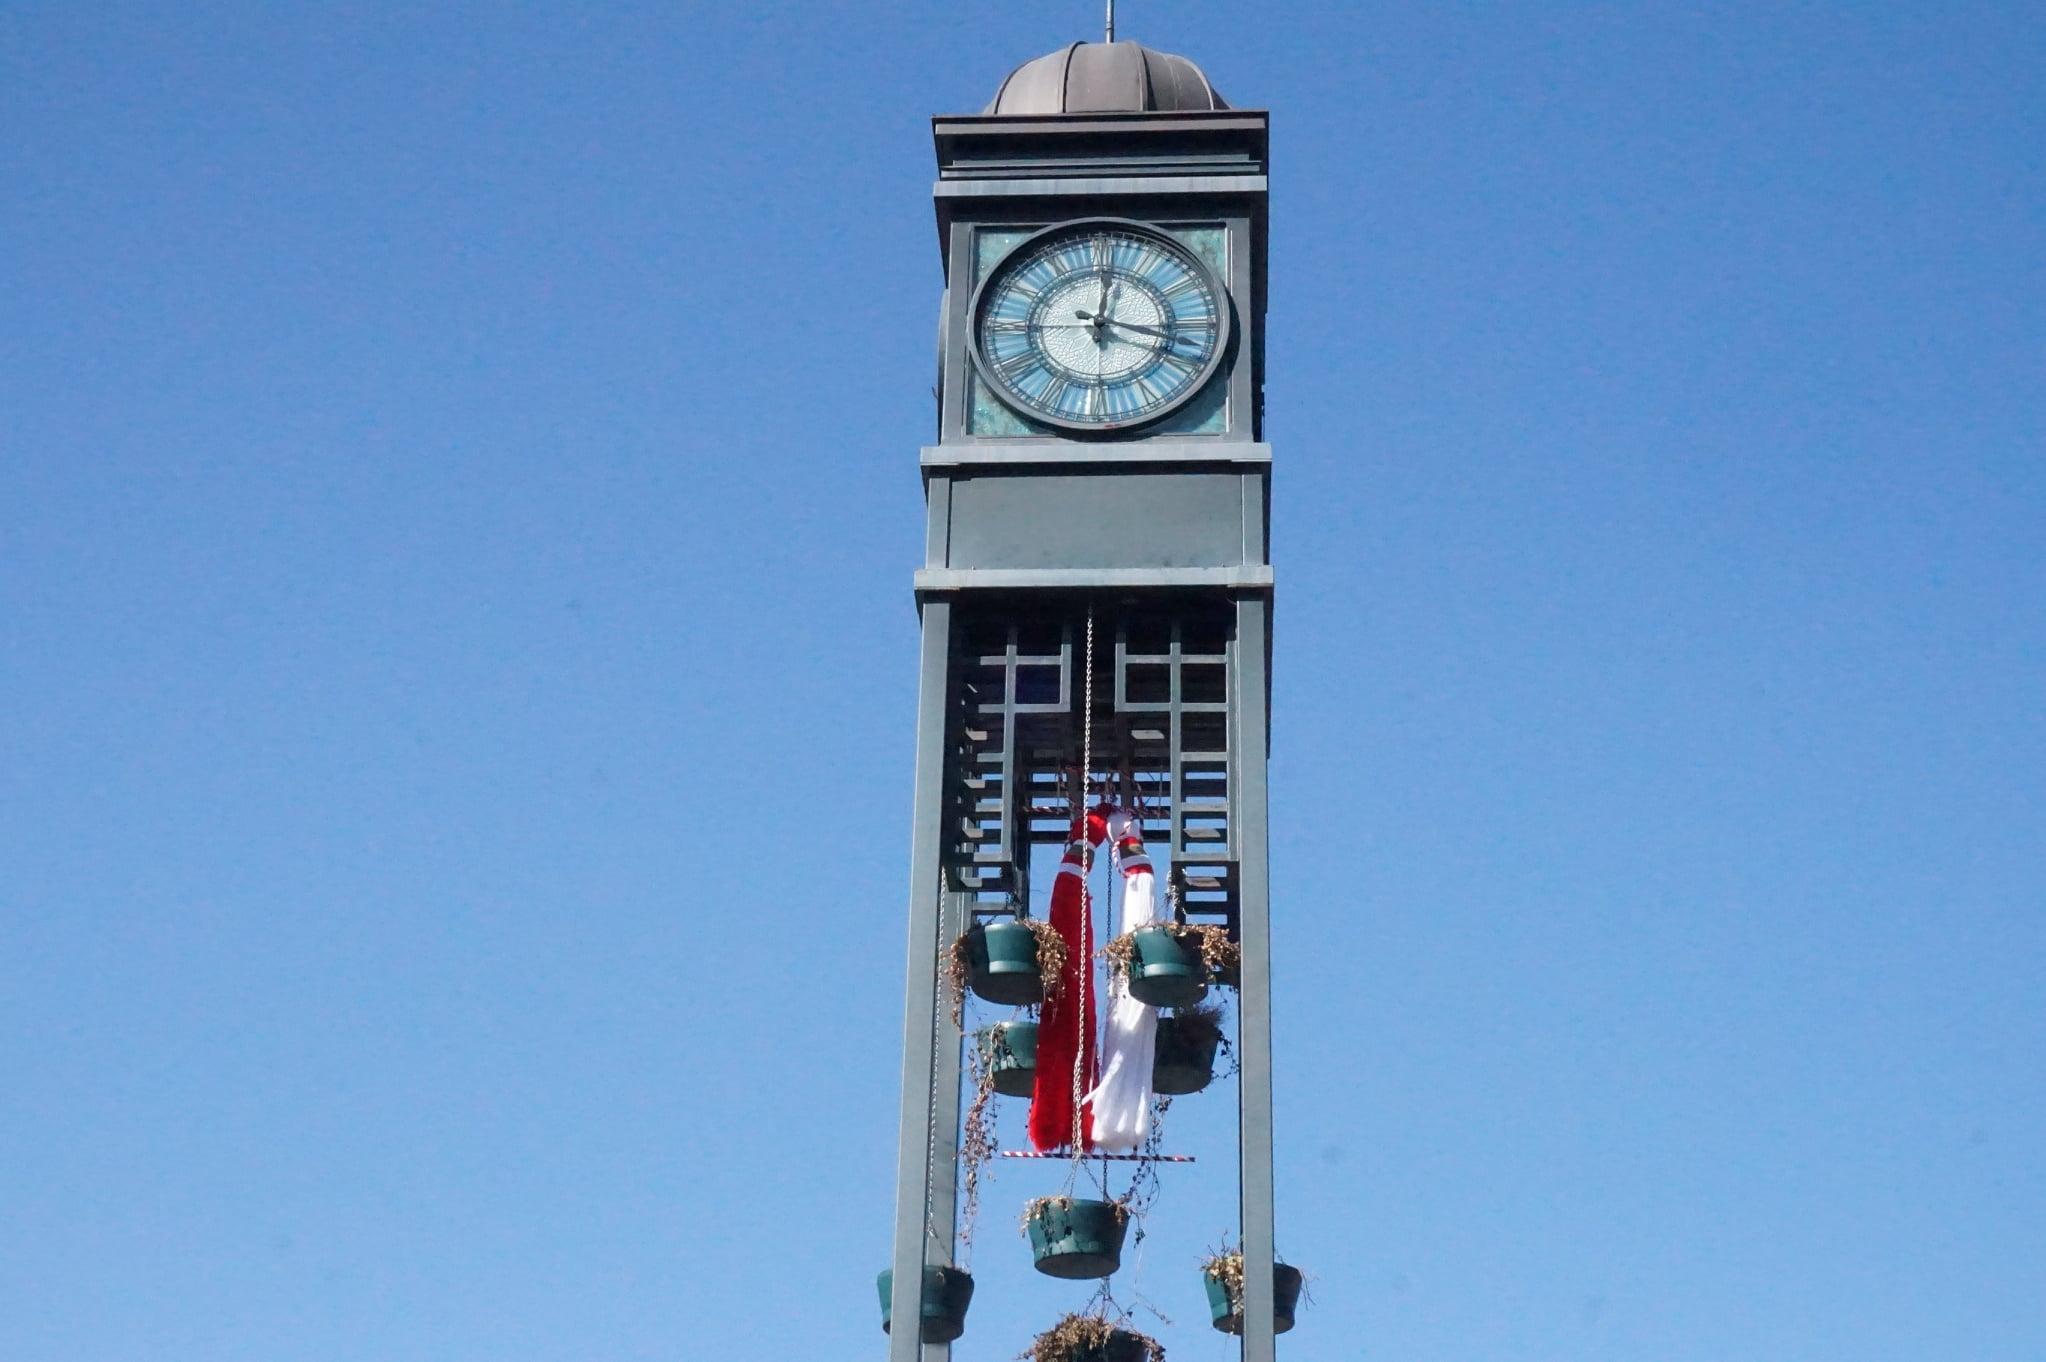 Гигантска мартеница украси кулата с часовника в Банкя